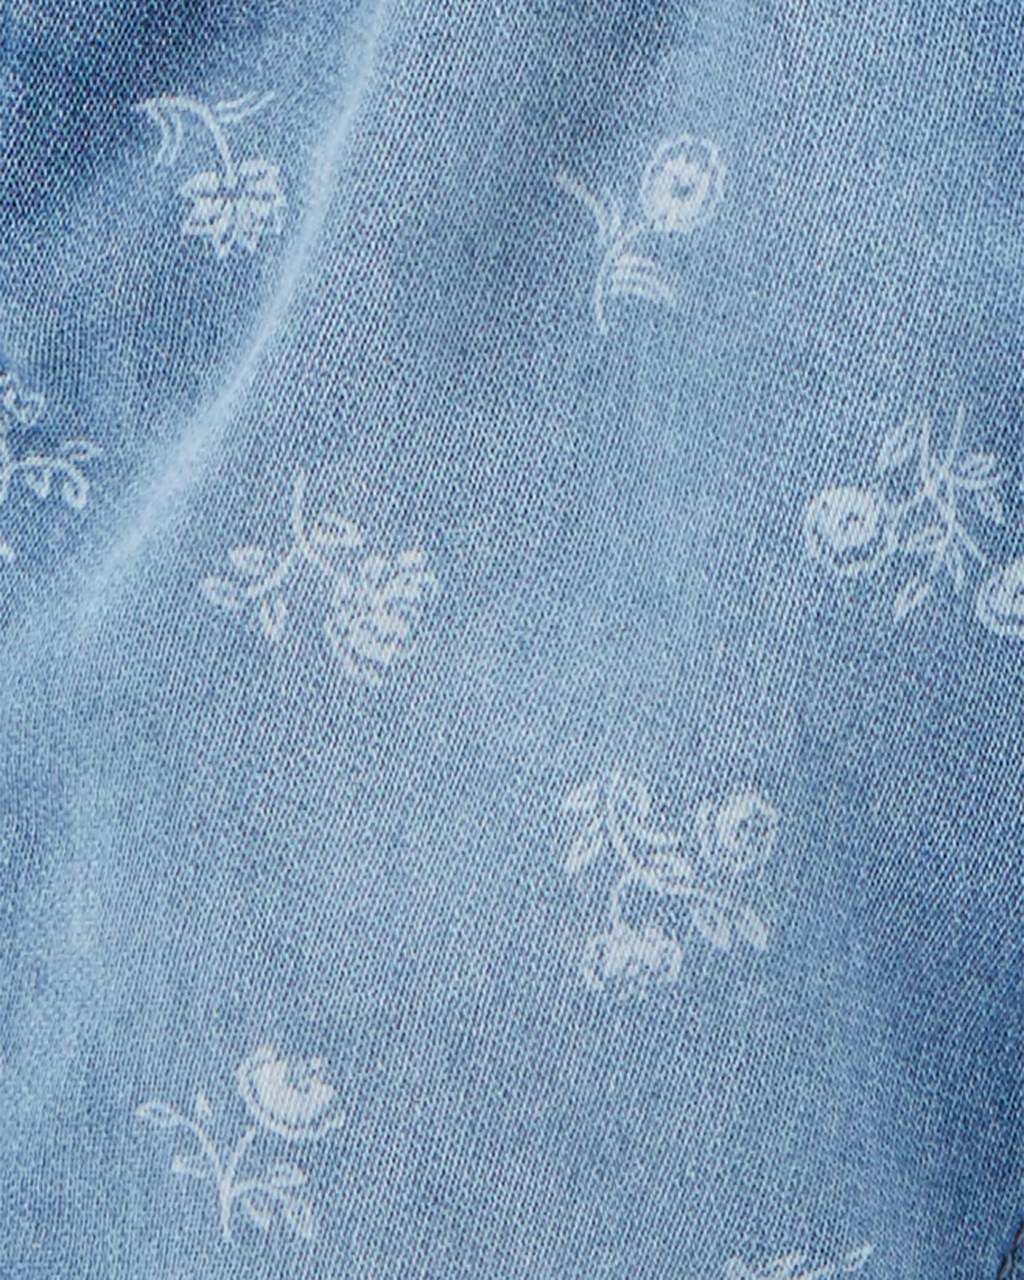 Jardineira Jeans OshKosh Floral Knit